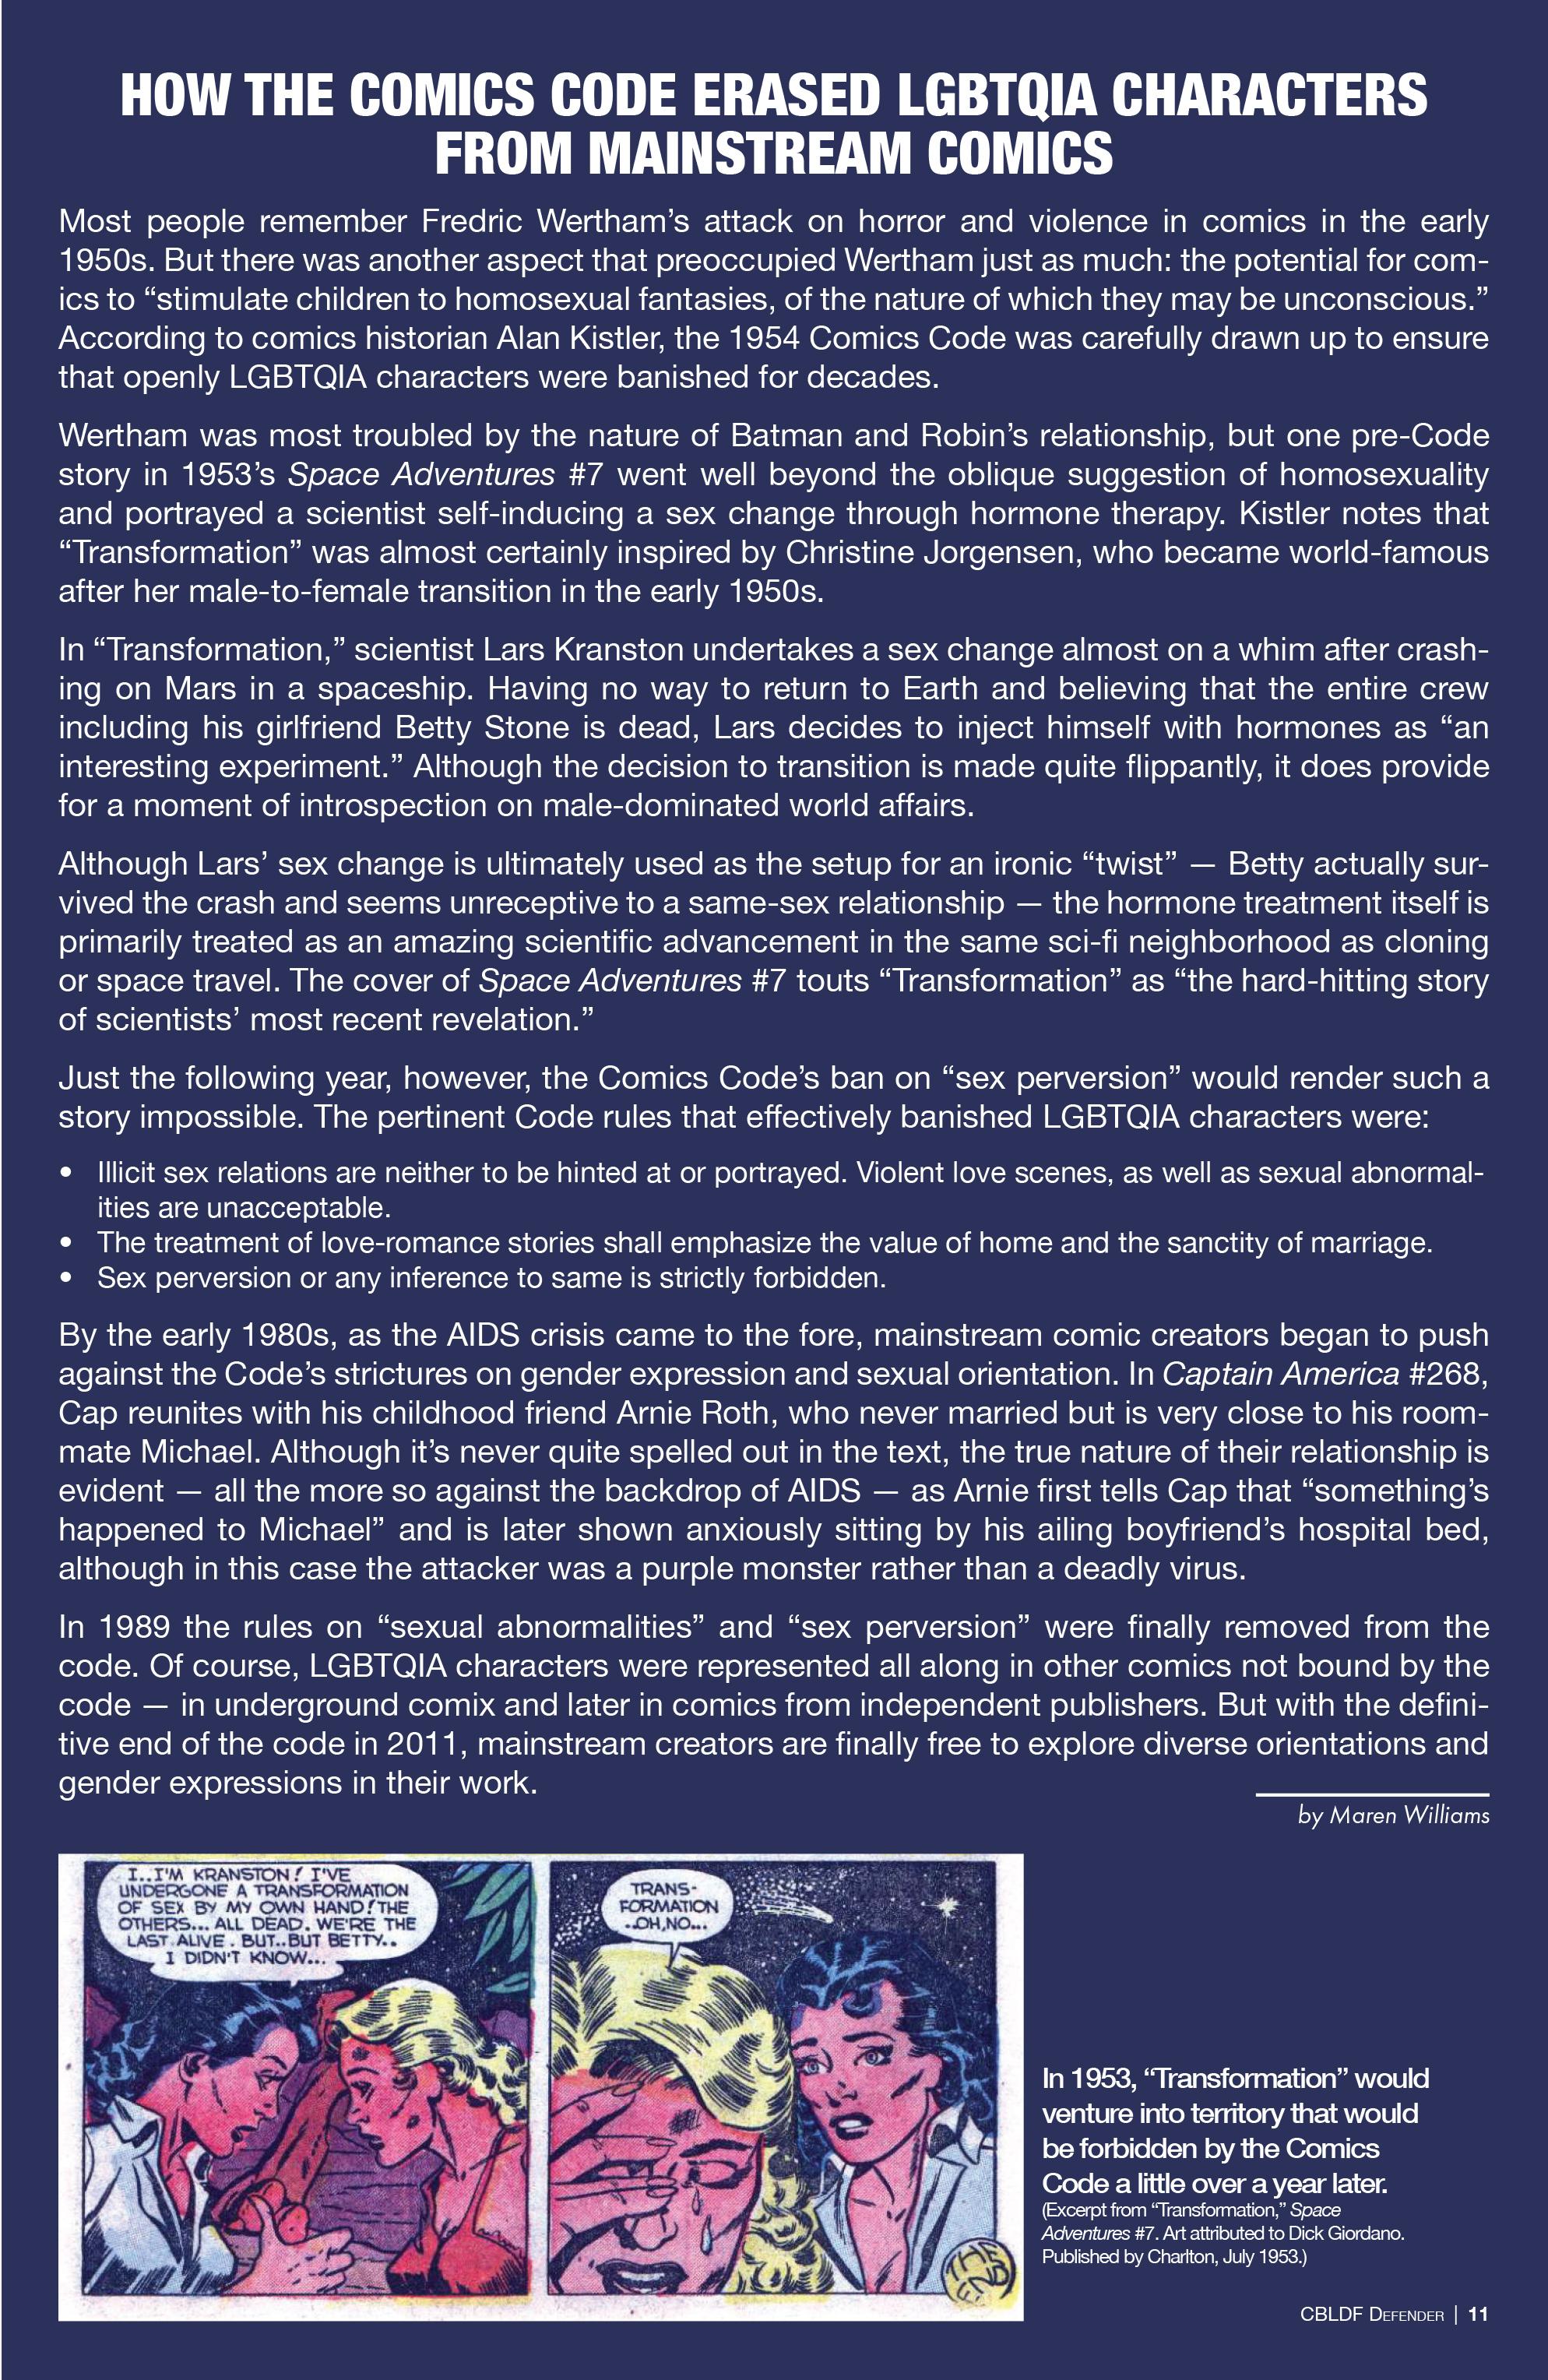 Read online CBLDF Defender Vol. 2 comic -  Issue #2 - 11